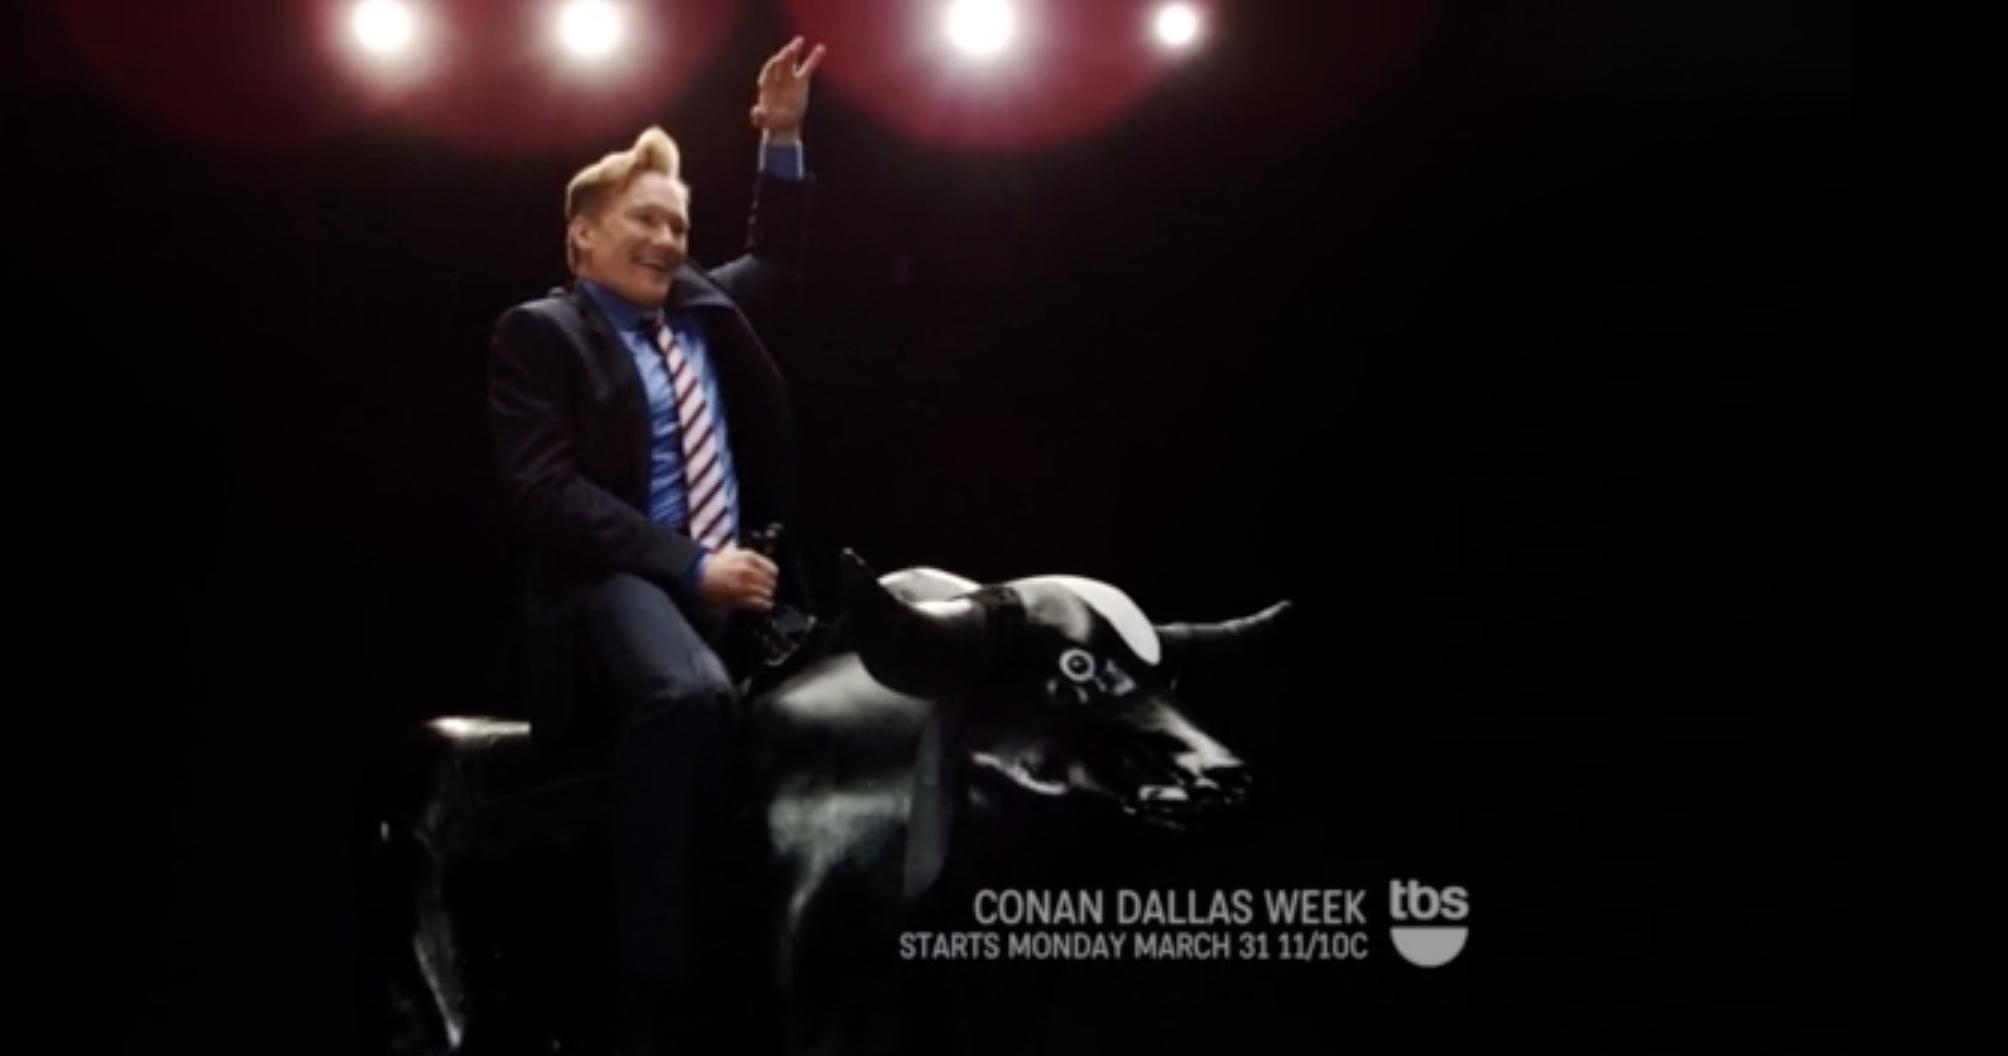 Conan x tbs, Figaro - :30 on-air promo, copywriter